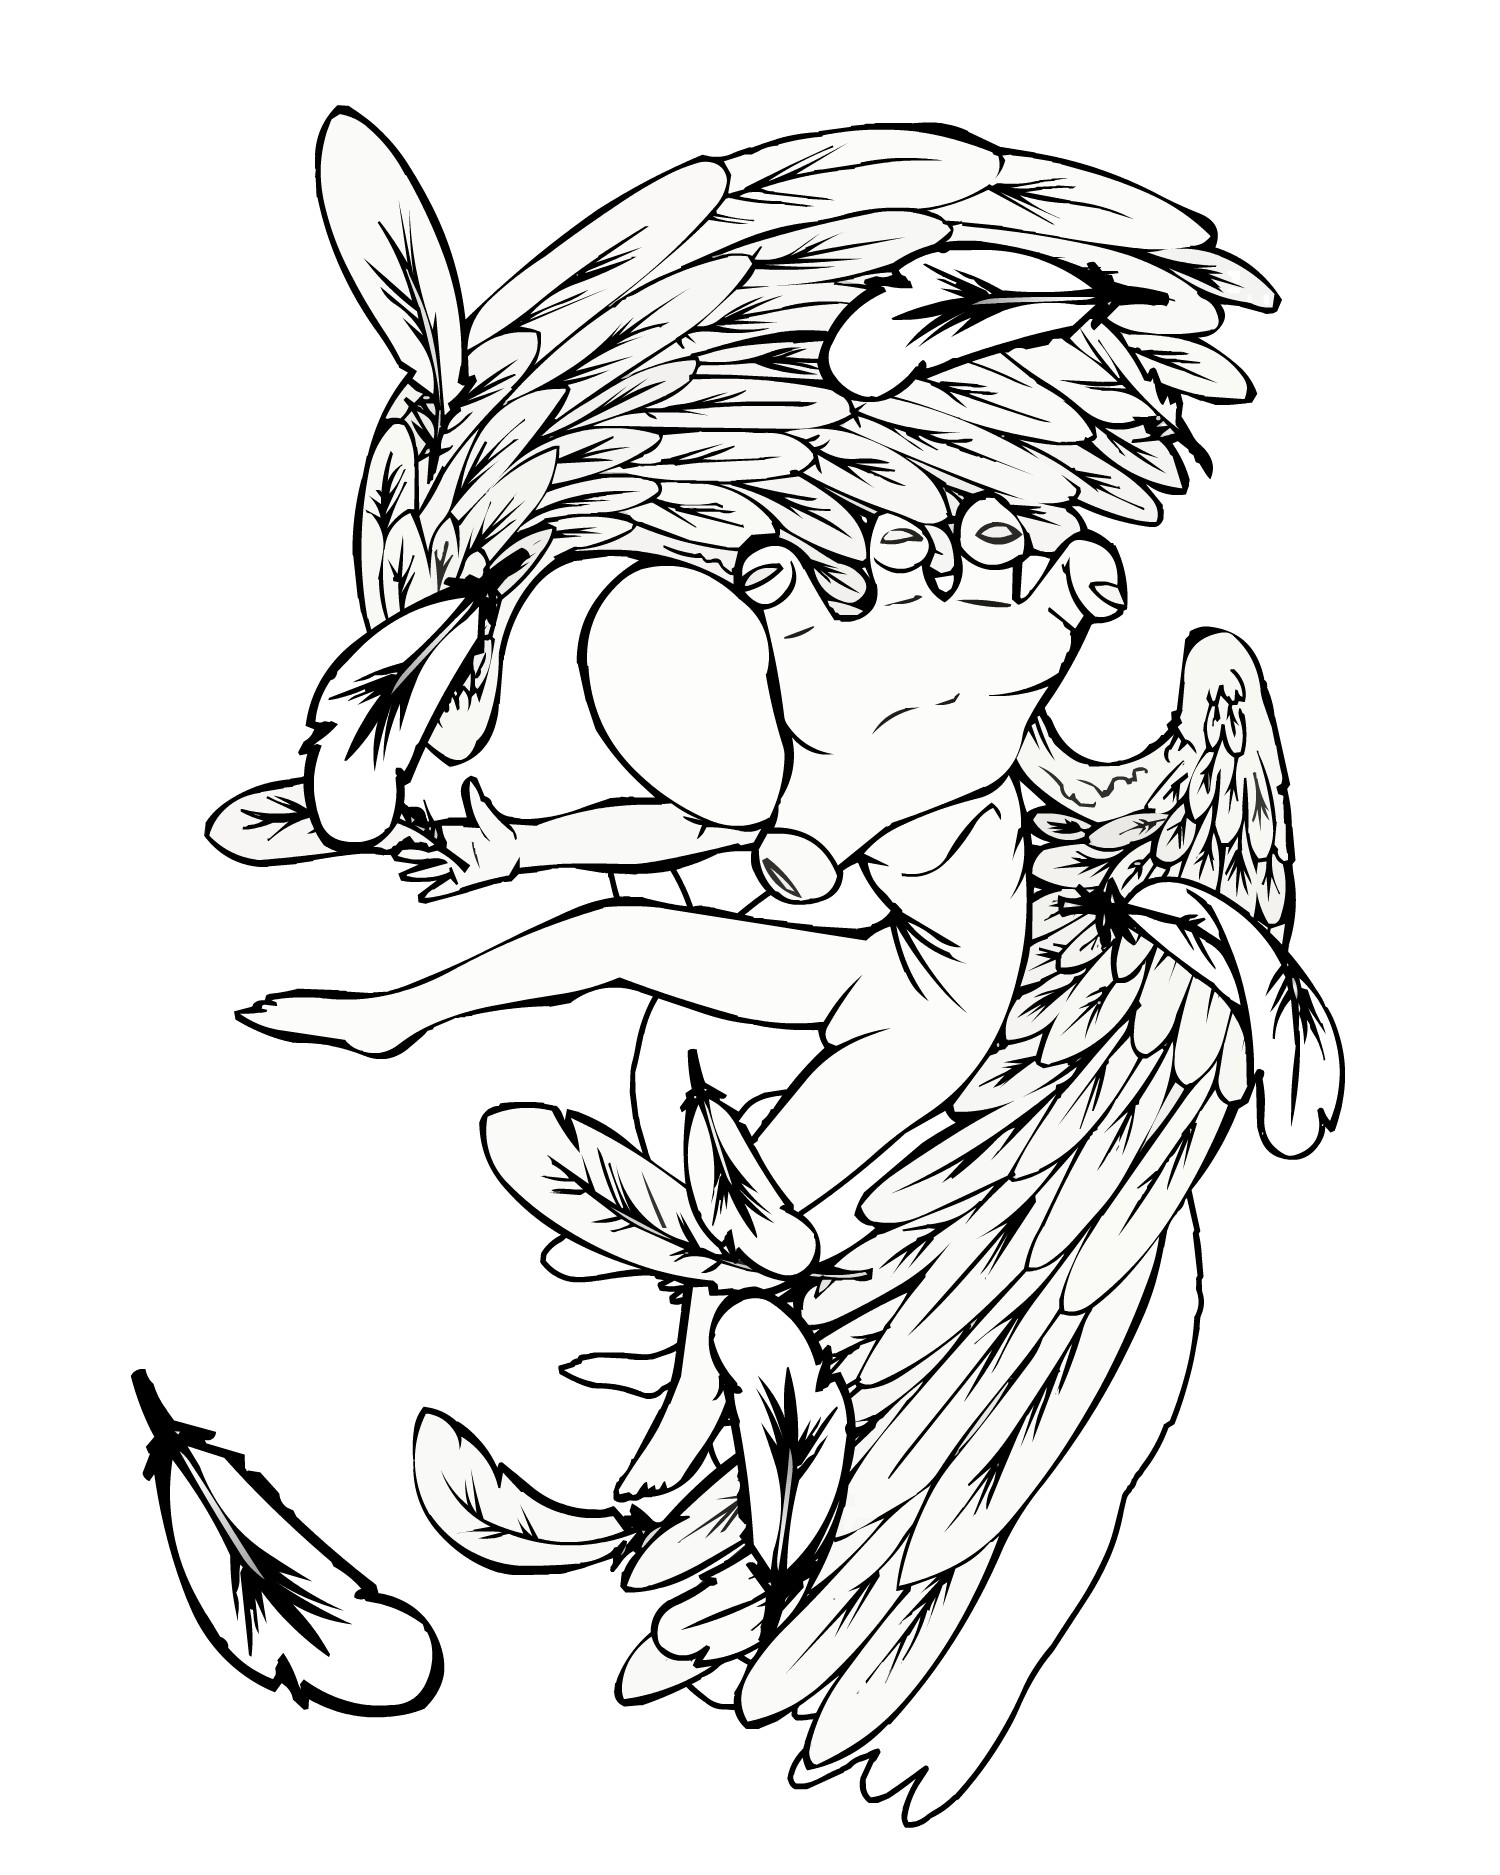 1500x1875 Angel Tattoo Falling Or Fallen Angel Design Free Flash